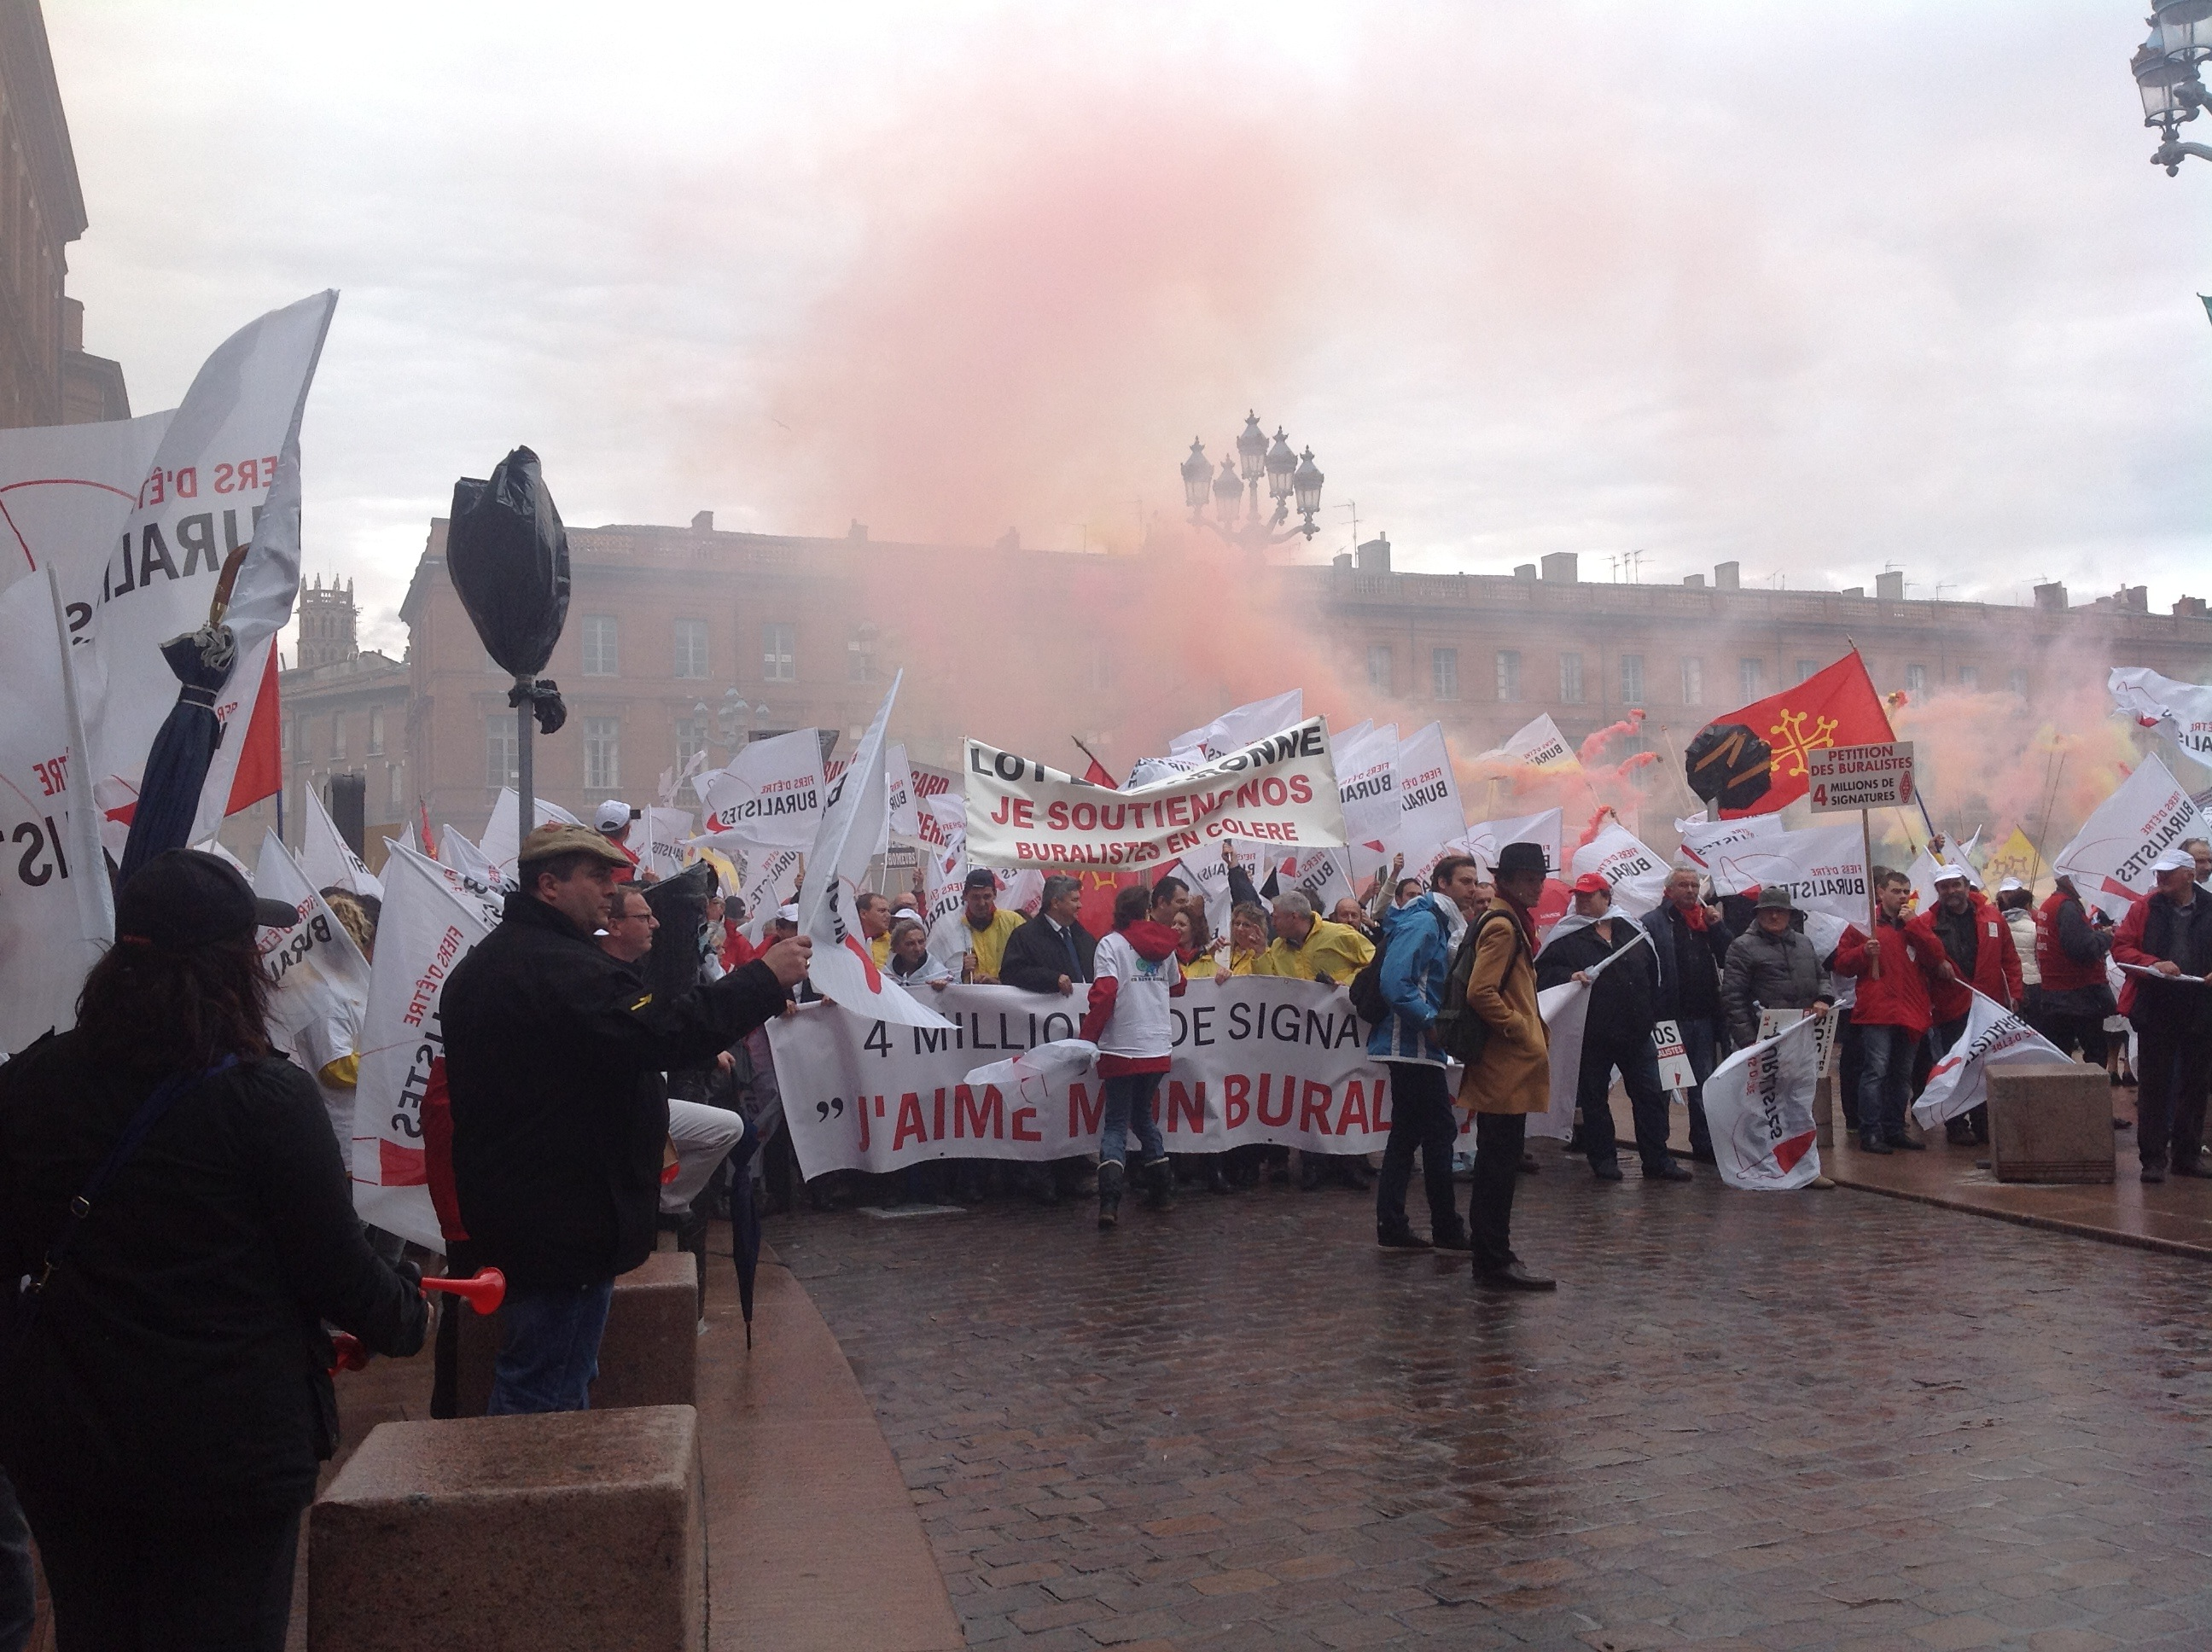 http://www.lemondedutabac.com/wp-content/uploads/2013/05/Buralistes-Toulouse-61.jpg